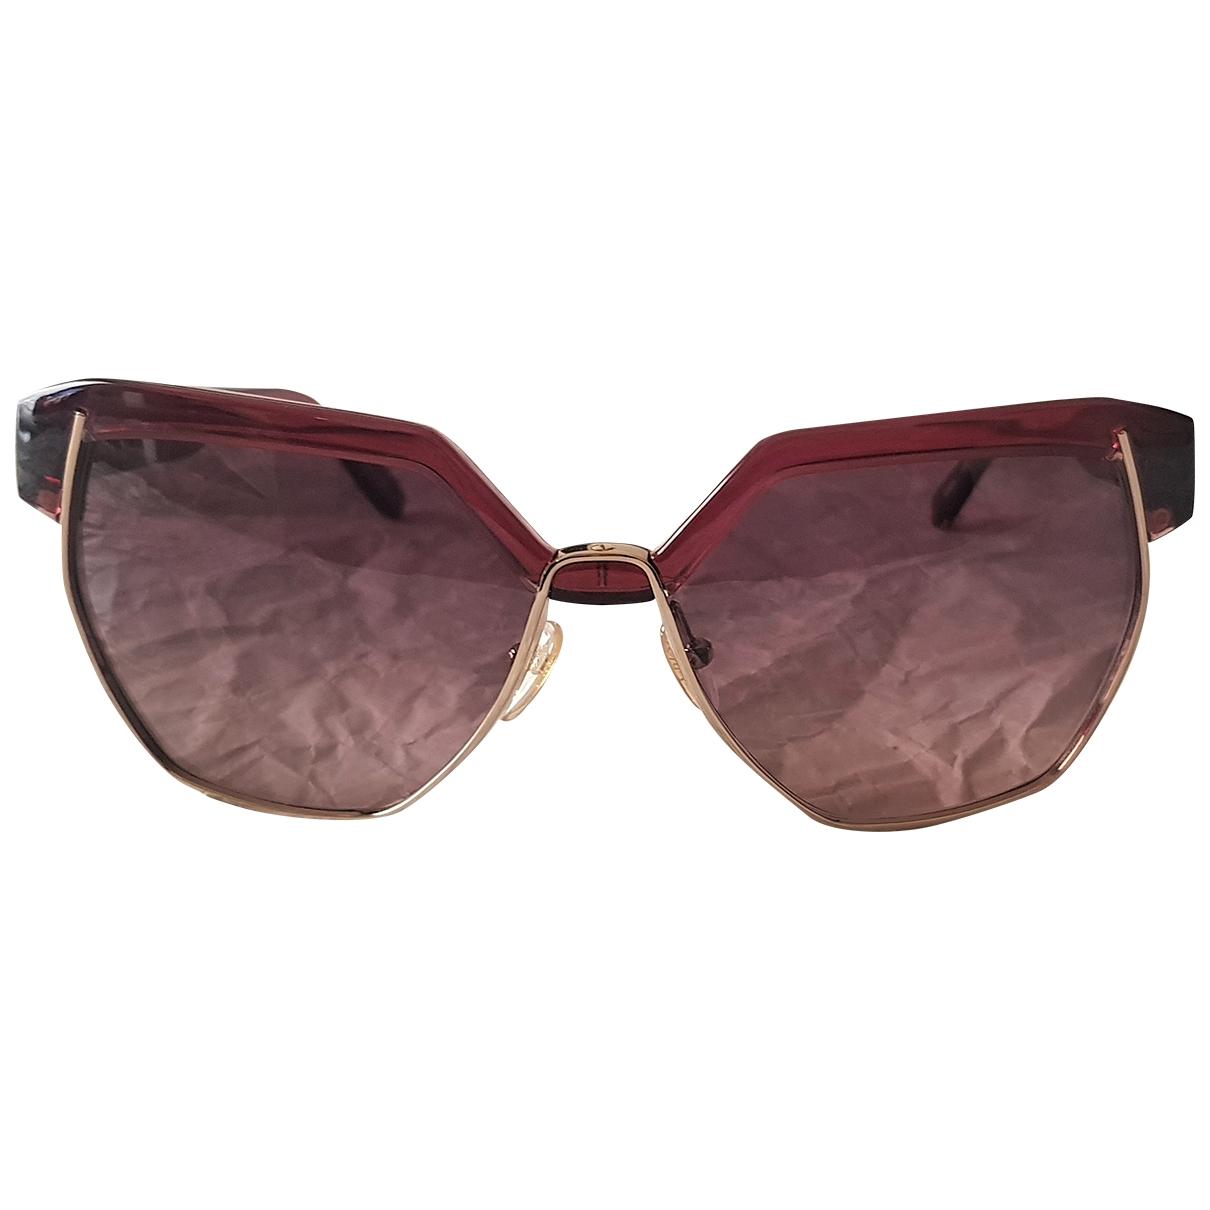 Chloé \N Burgundy Sunglasses for Women \N